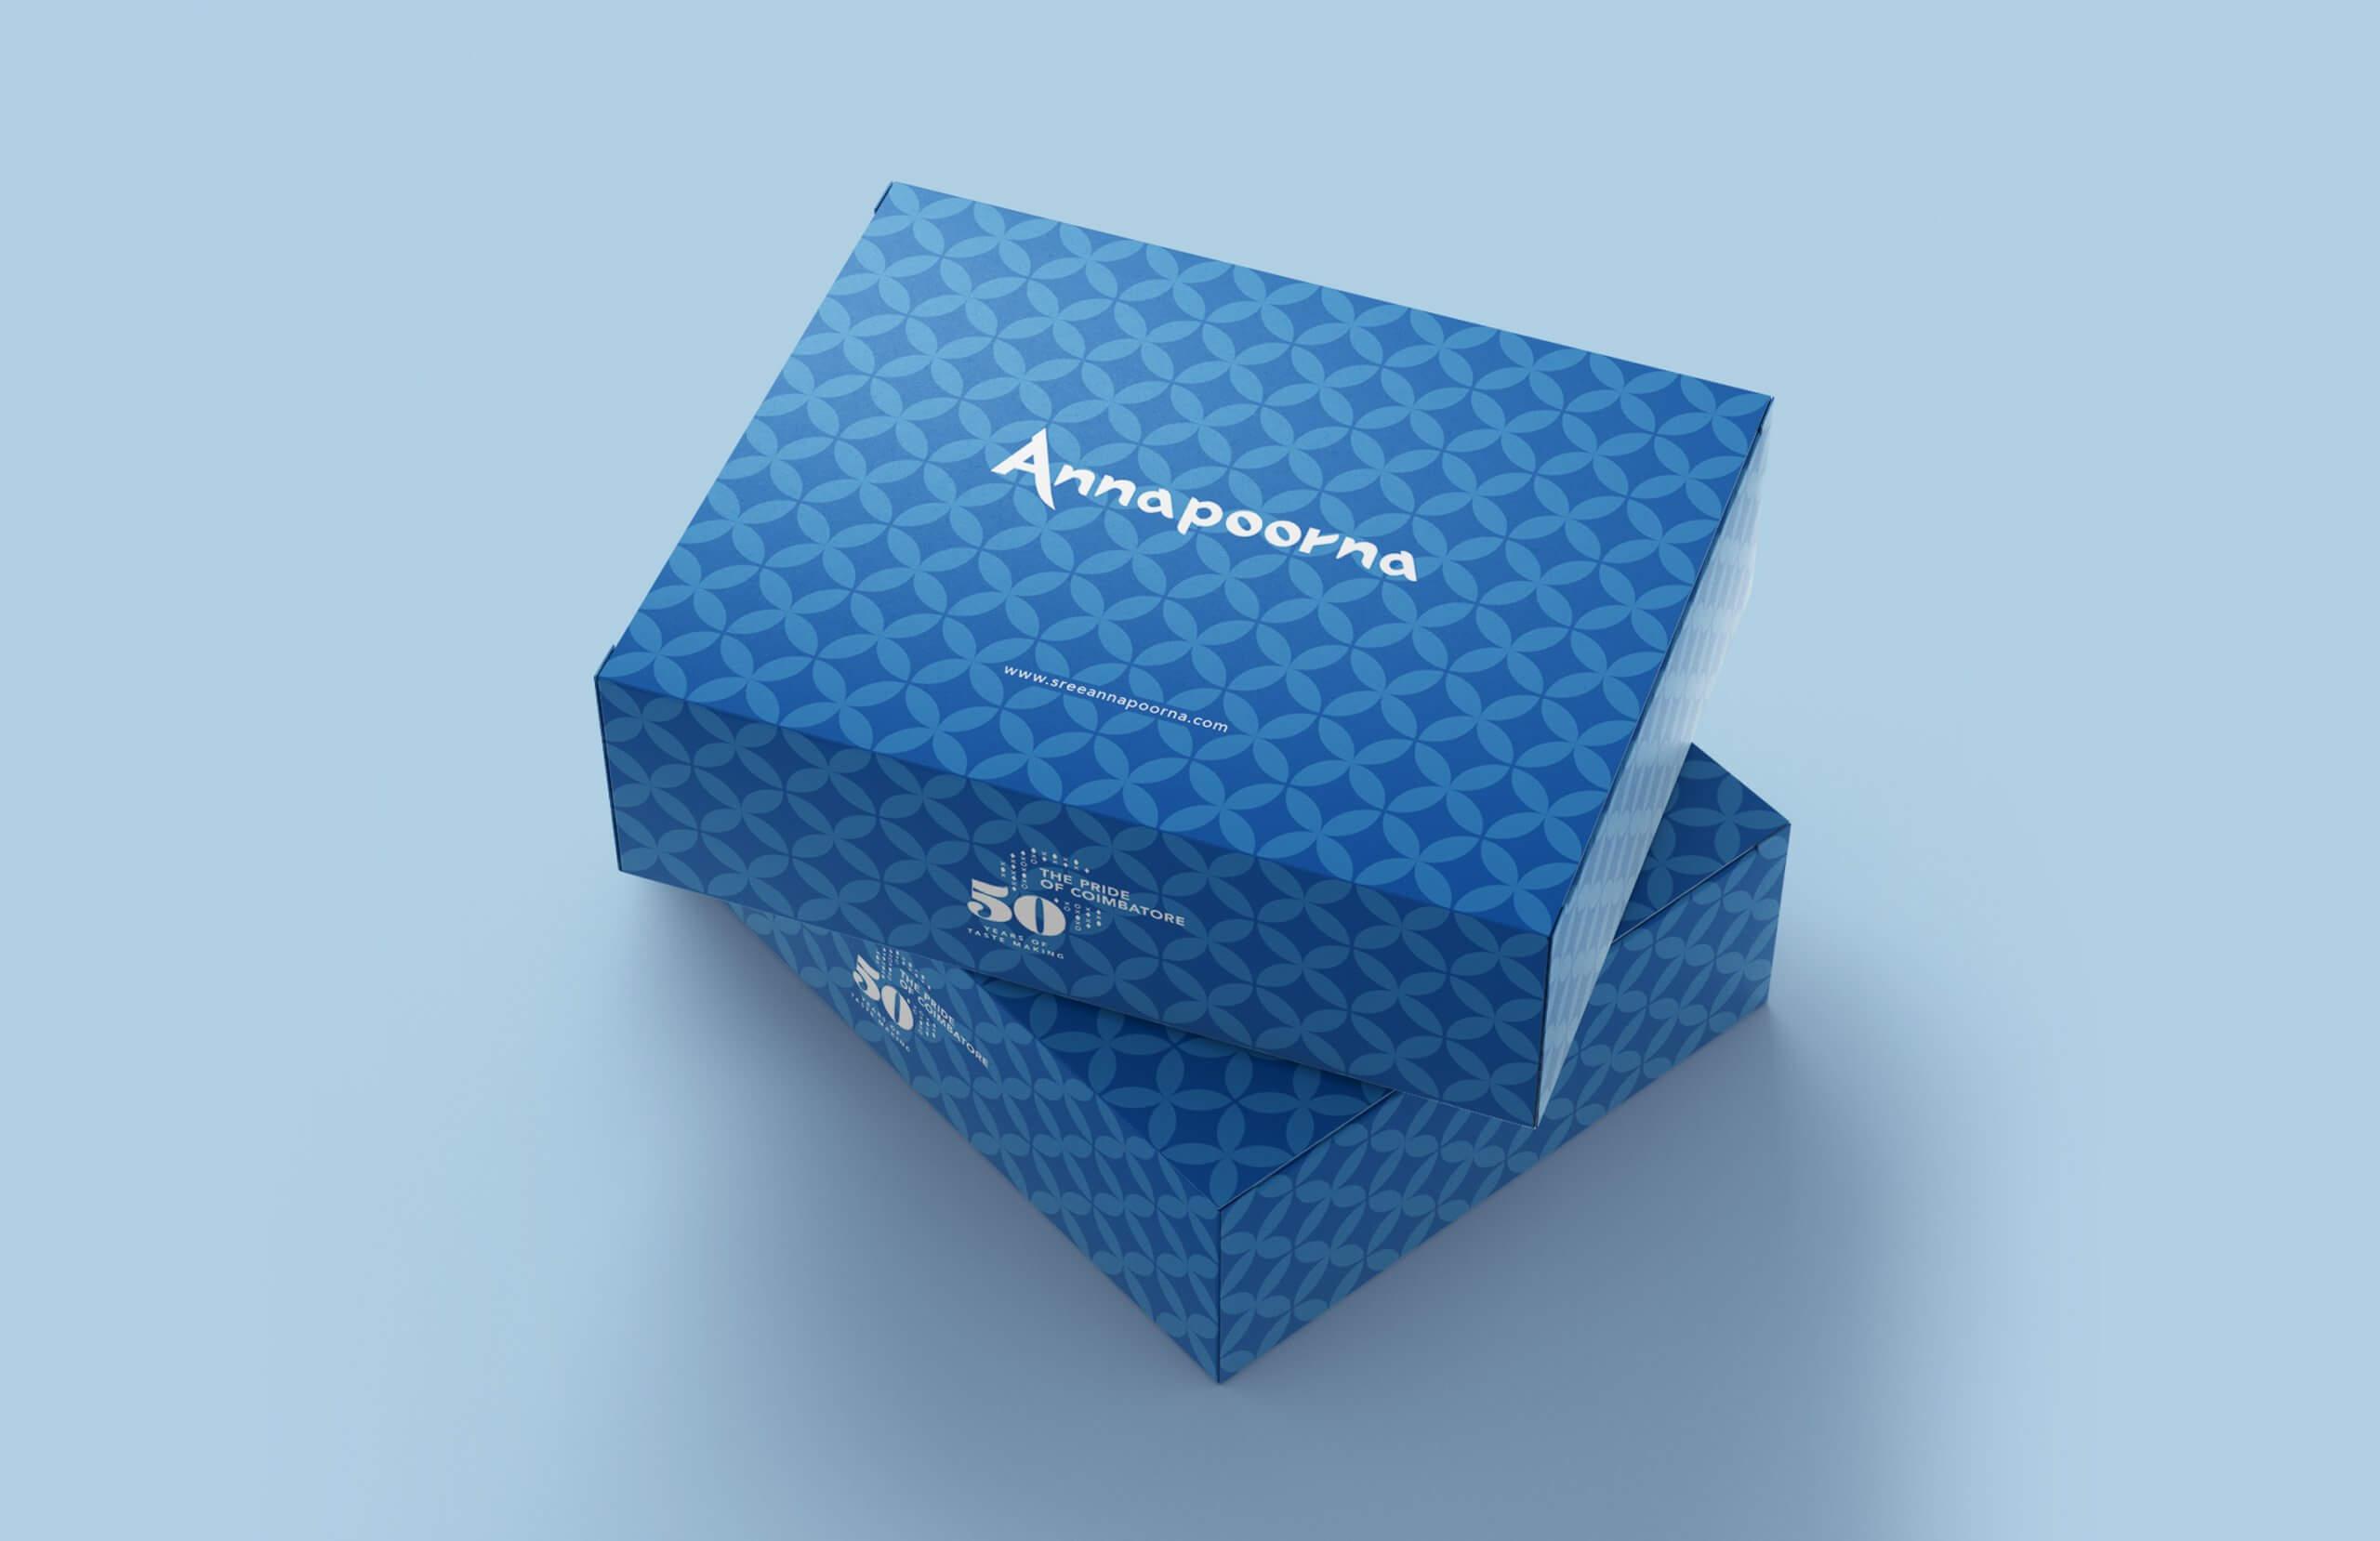 Annapoorna_Box_v07_2020